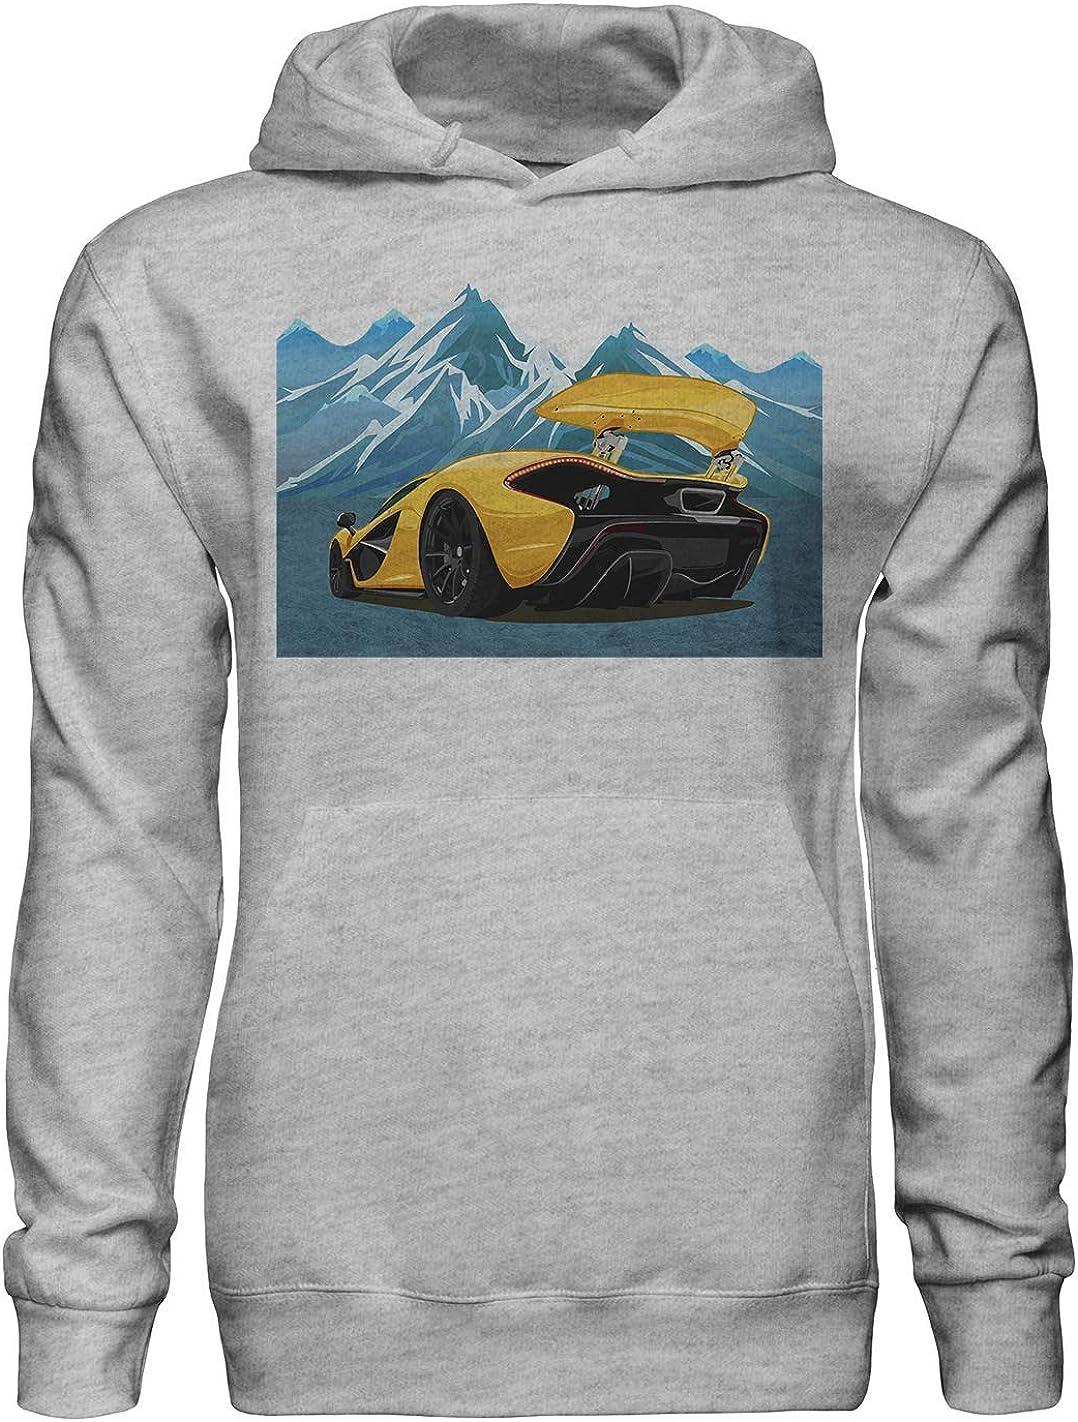 Mclaren Super Car Winter Inspired Artwork Fan Artwork Unisex ...